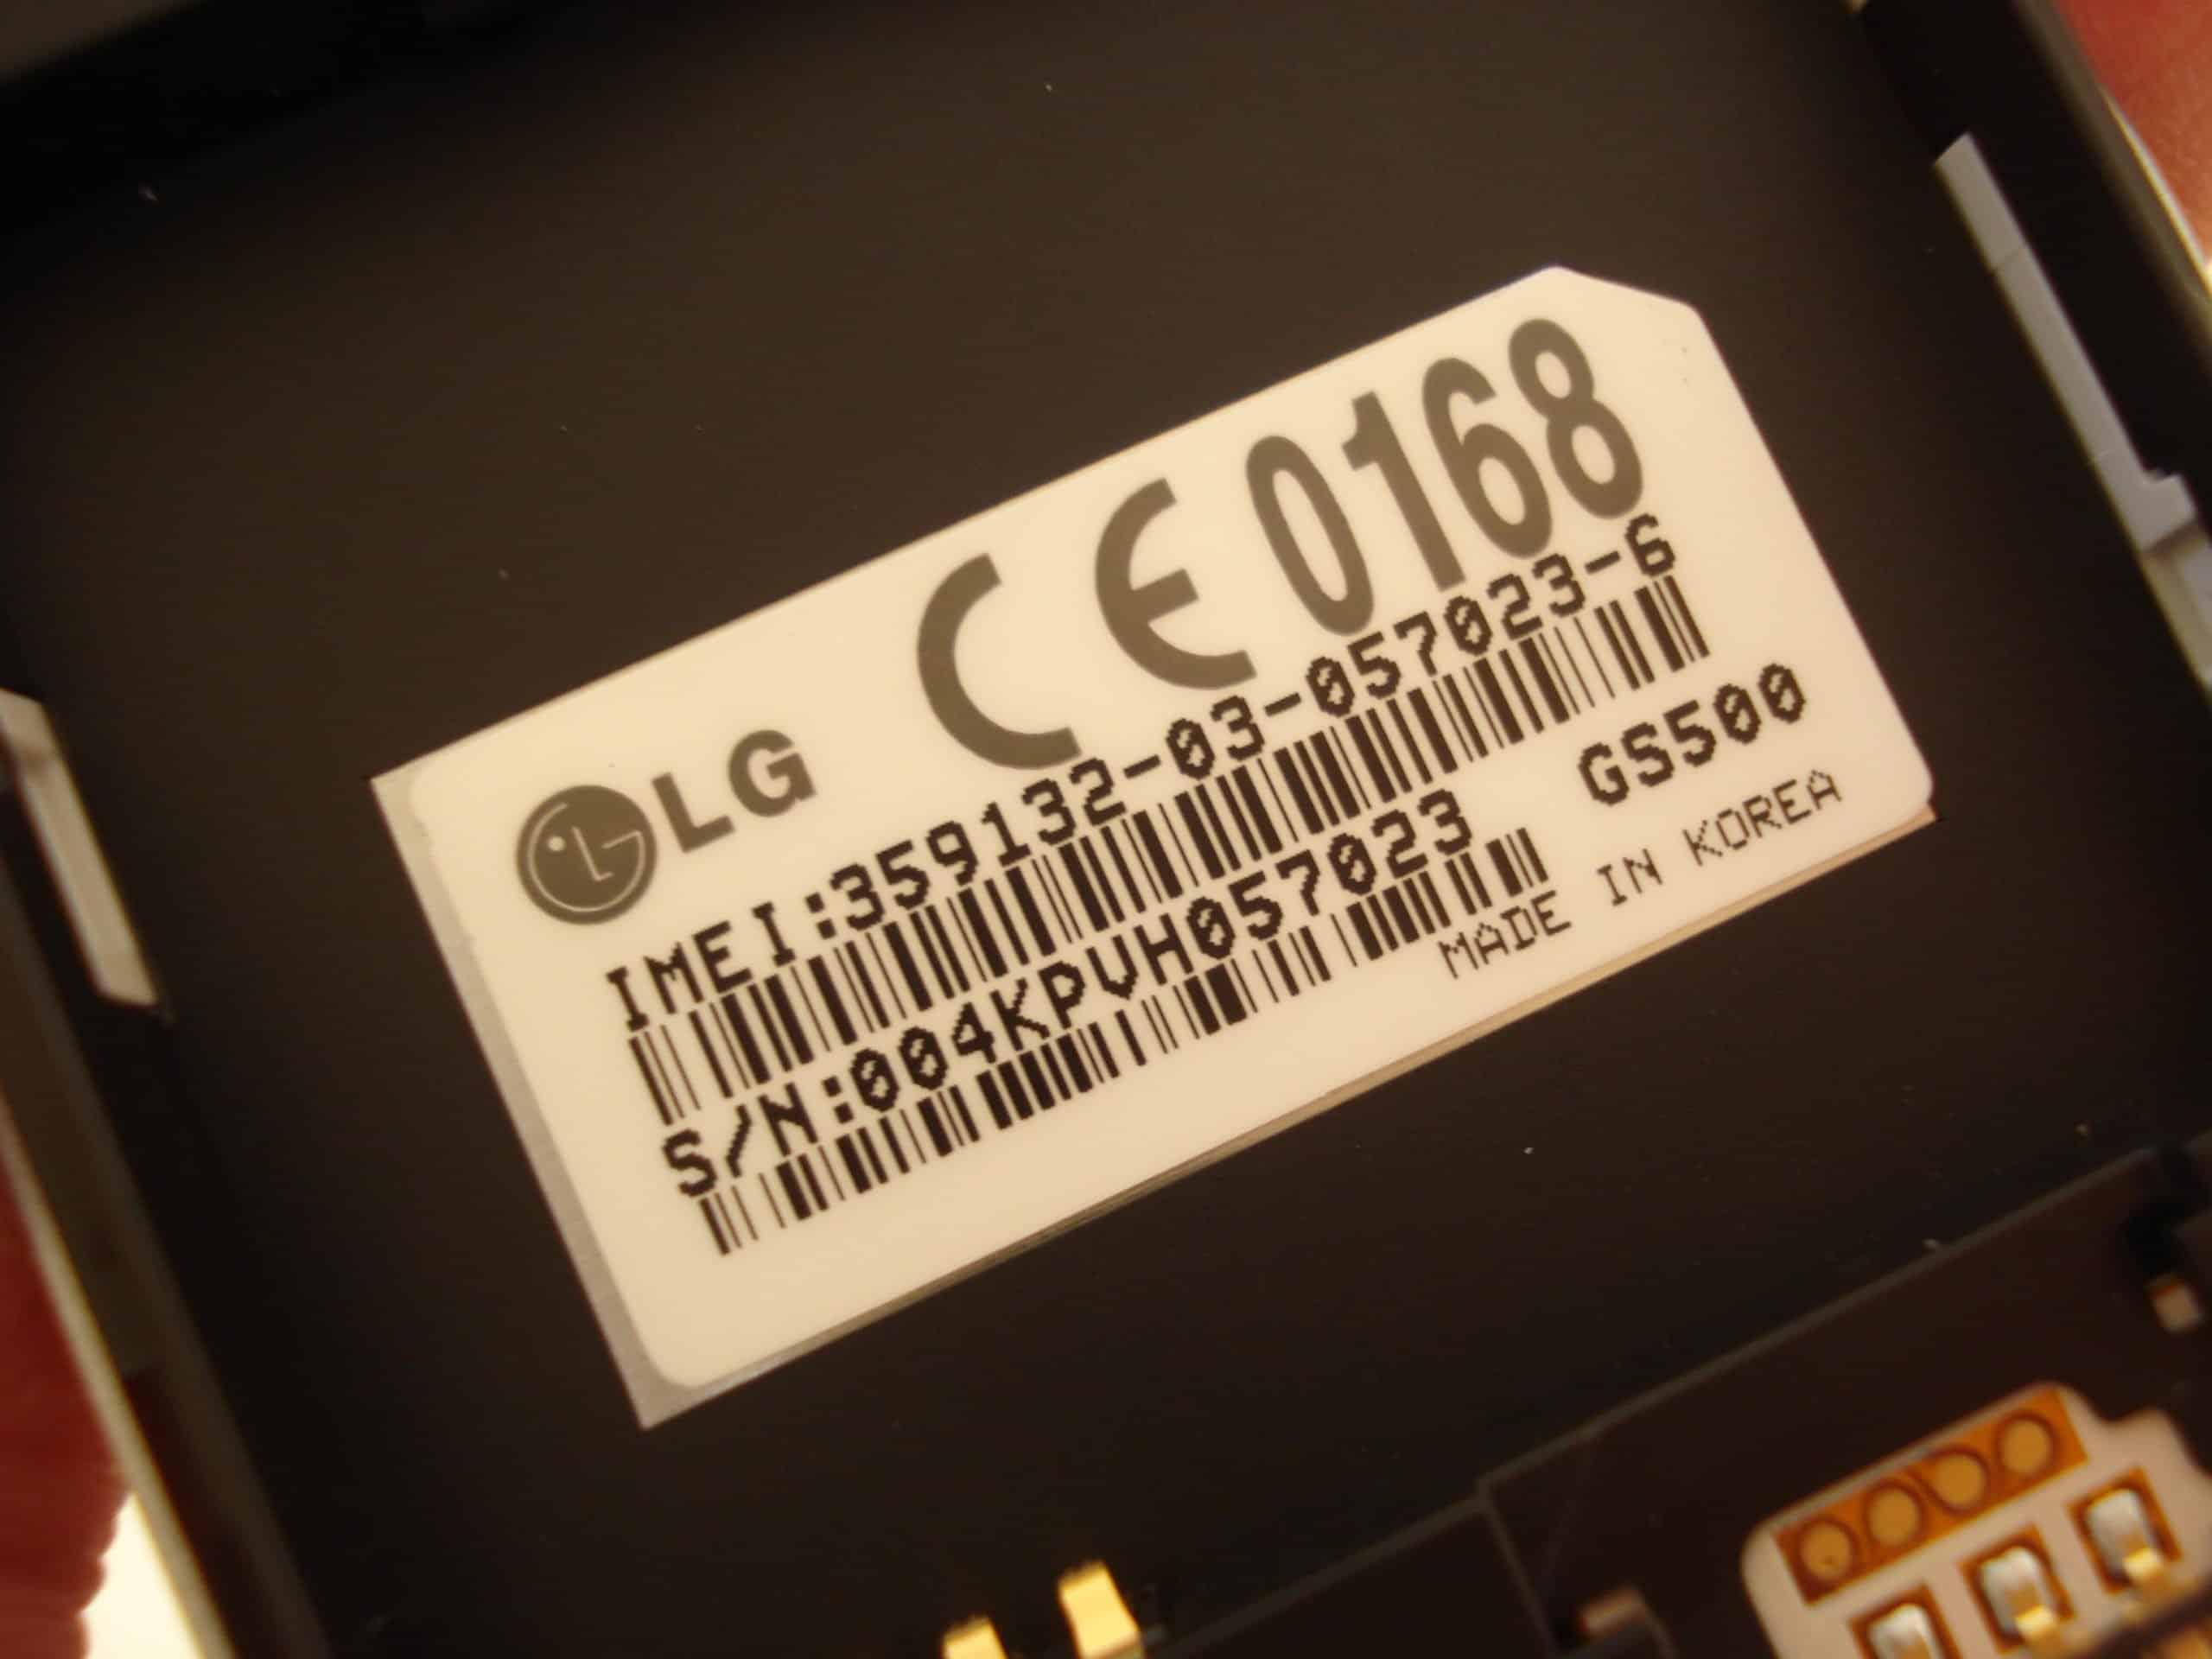 Jika-Anda-sudah-berhasil-melepaskan-baterai-dari-perangkat-maka-nomor-IMEI